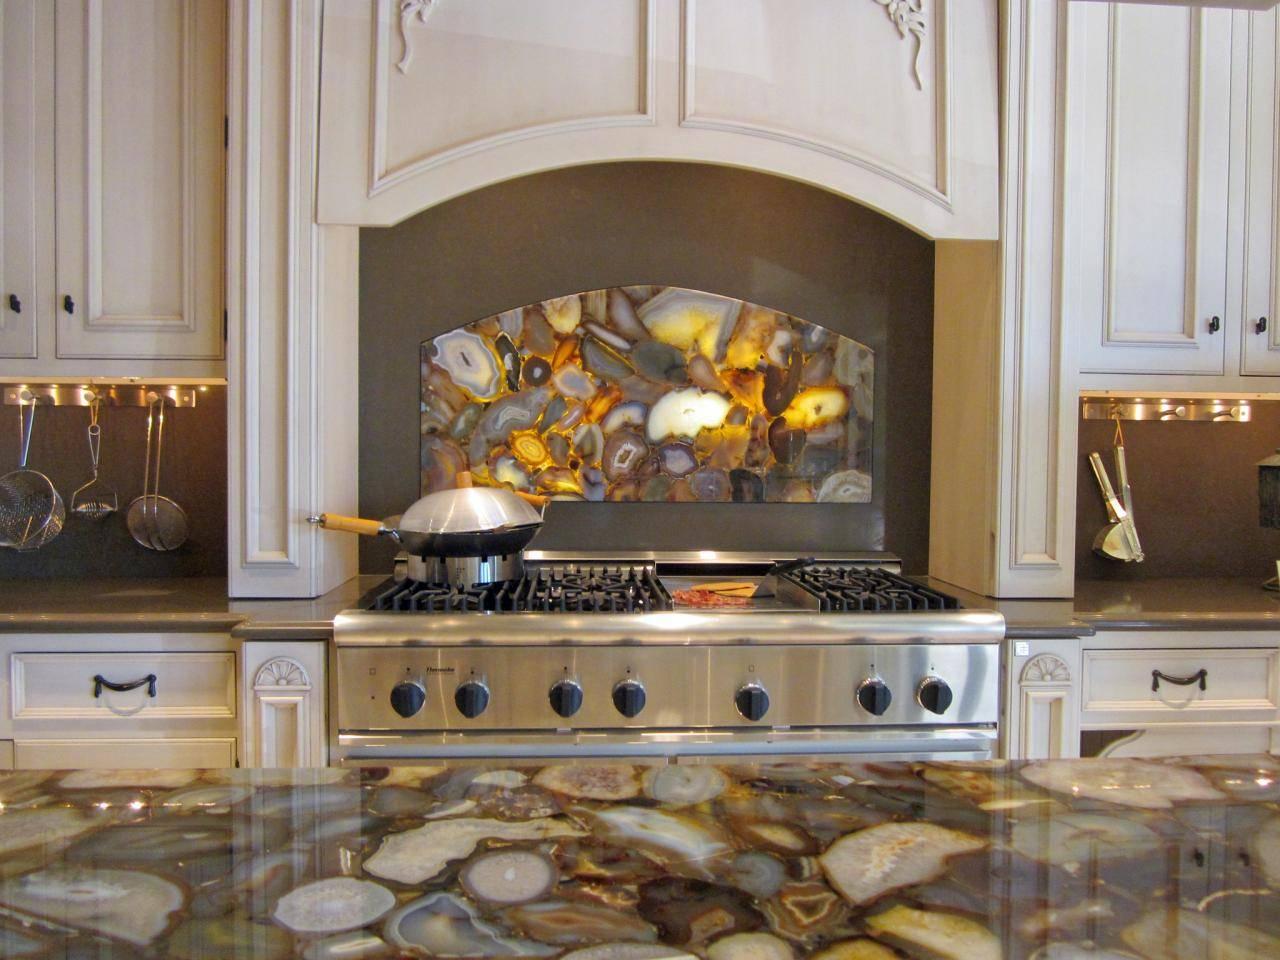 Kitchen Dining Stone Splash Nature Backsplash Your